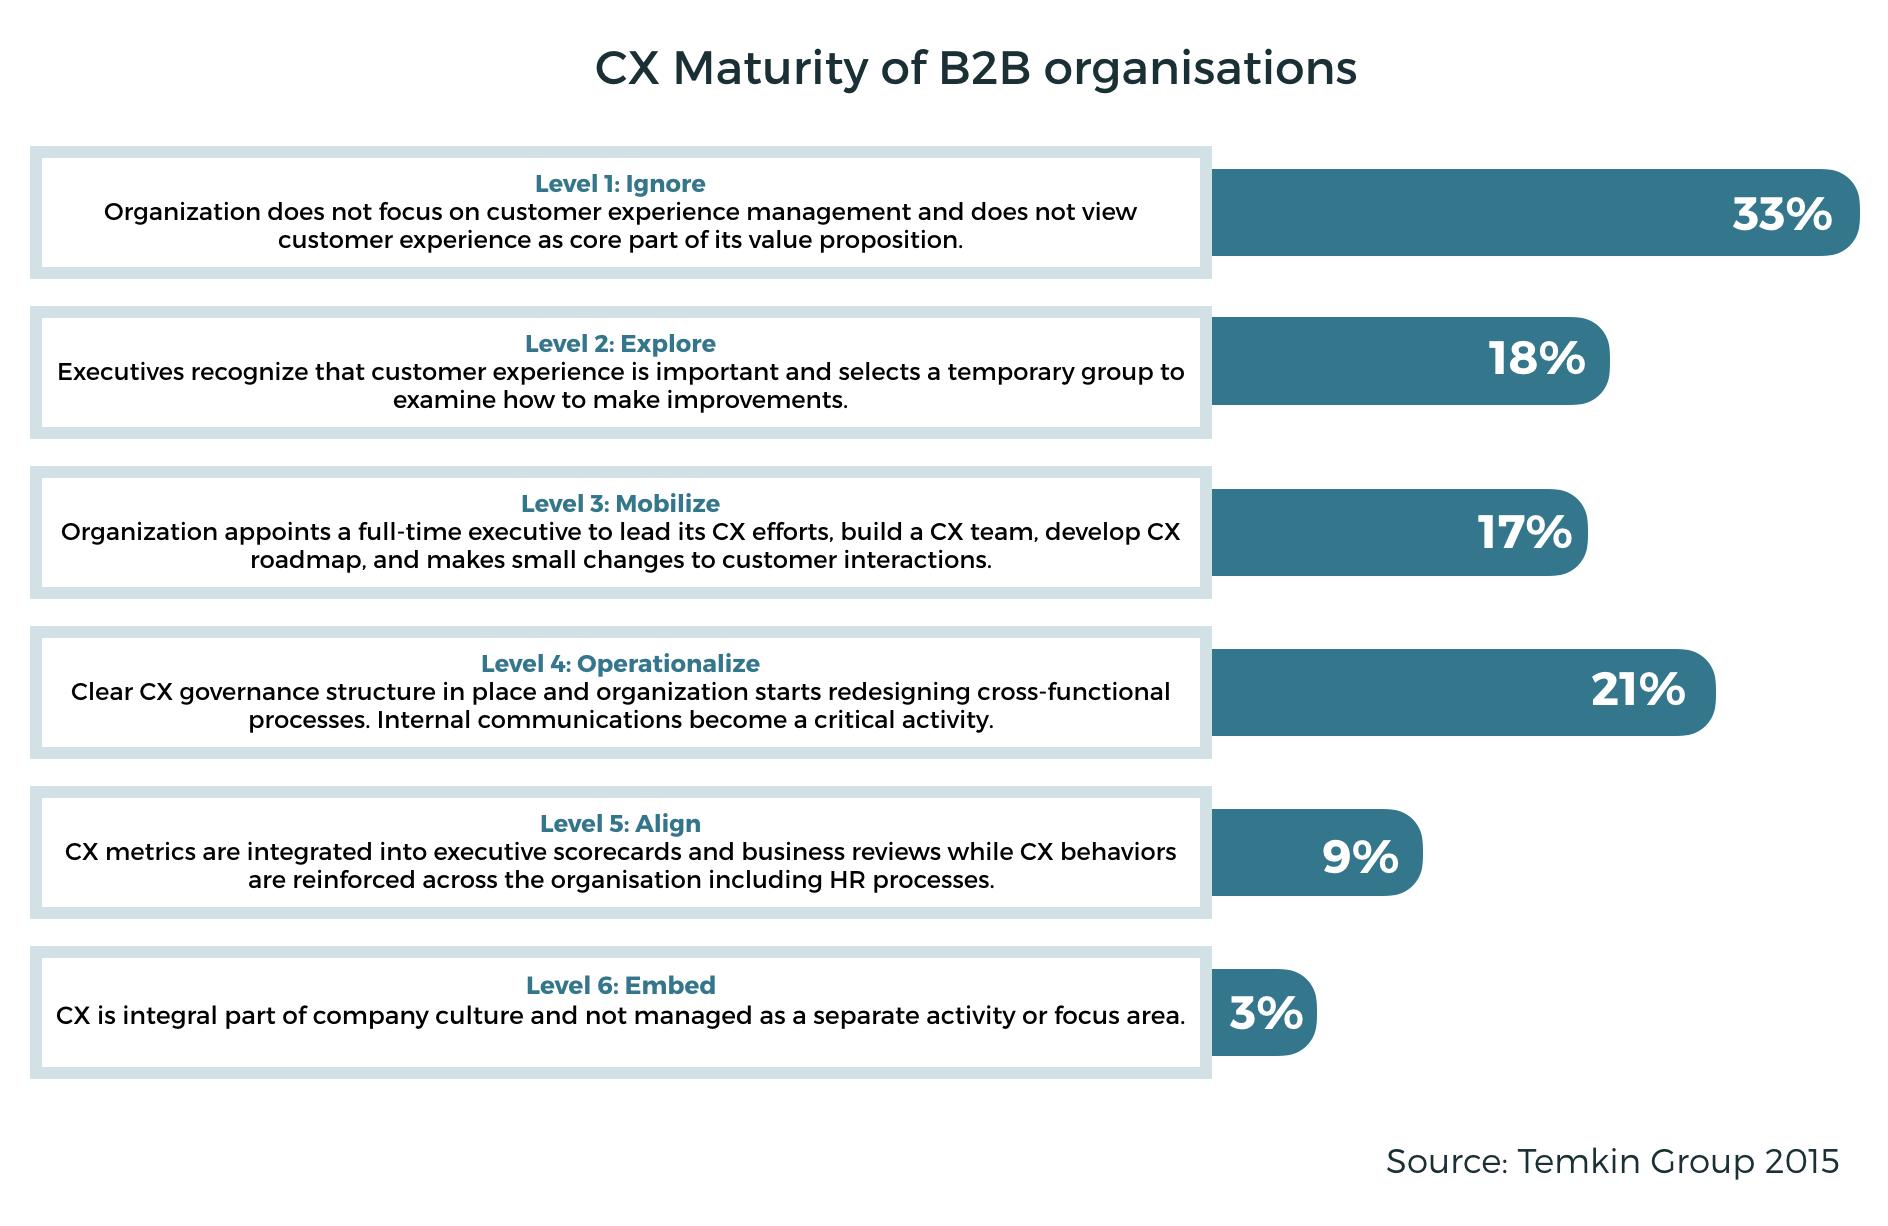 CX Maturity of B2B organizations